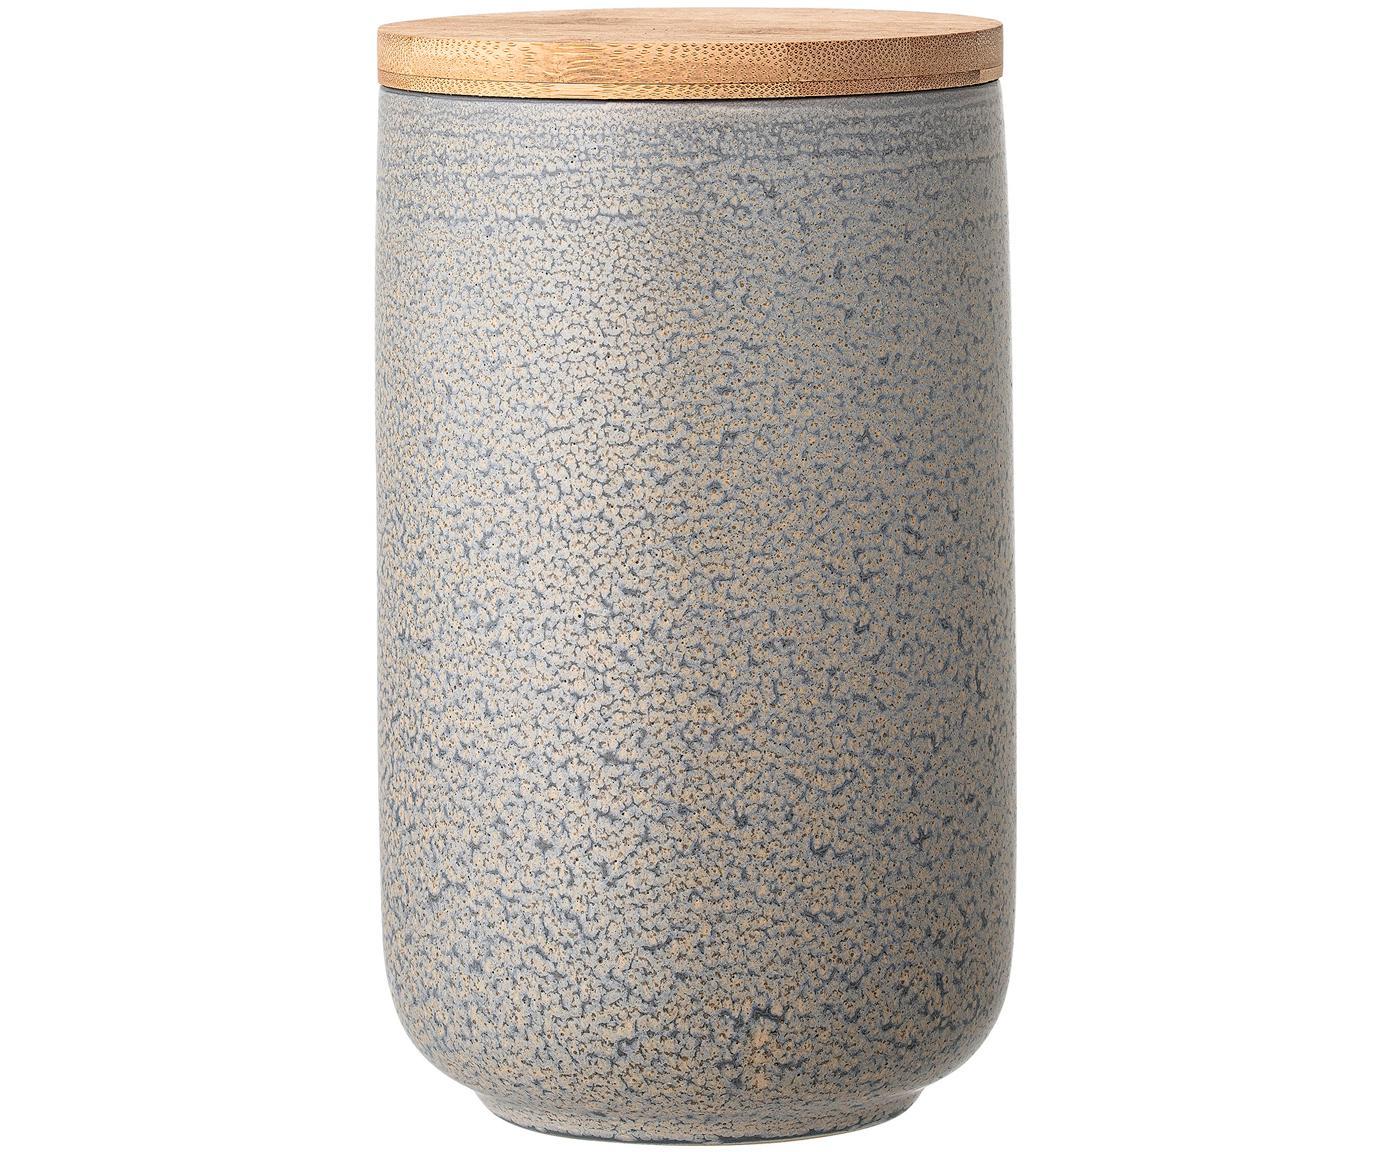 Handgemaakte opbergpot Kendra, Deksel: bamboehout, silicone, Grijs, beigetinten, Ø 12 x H 21 cm